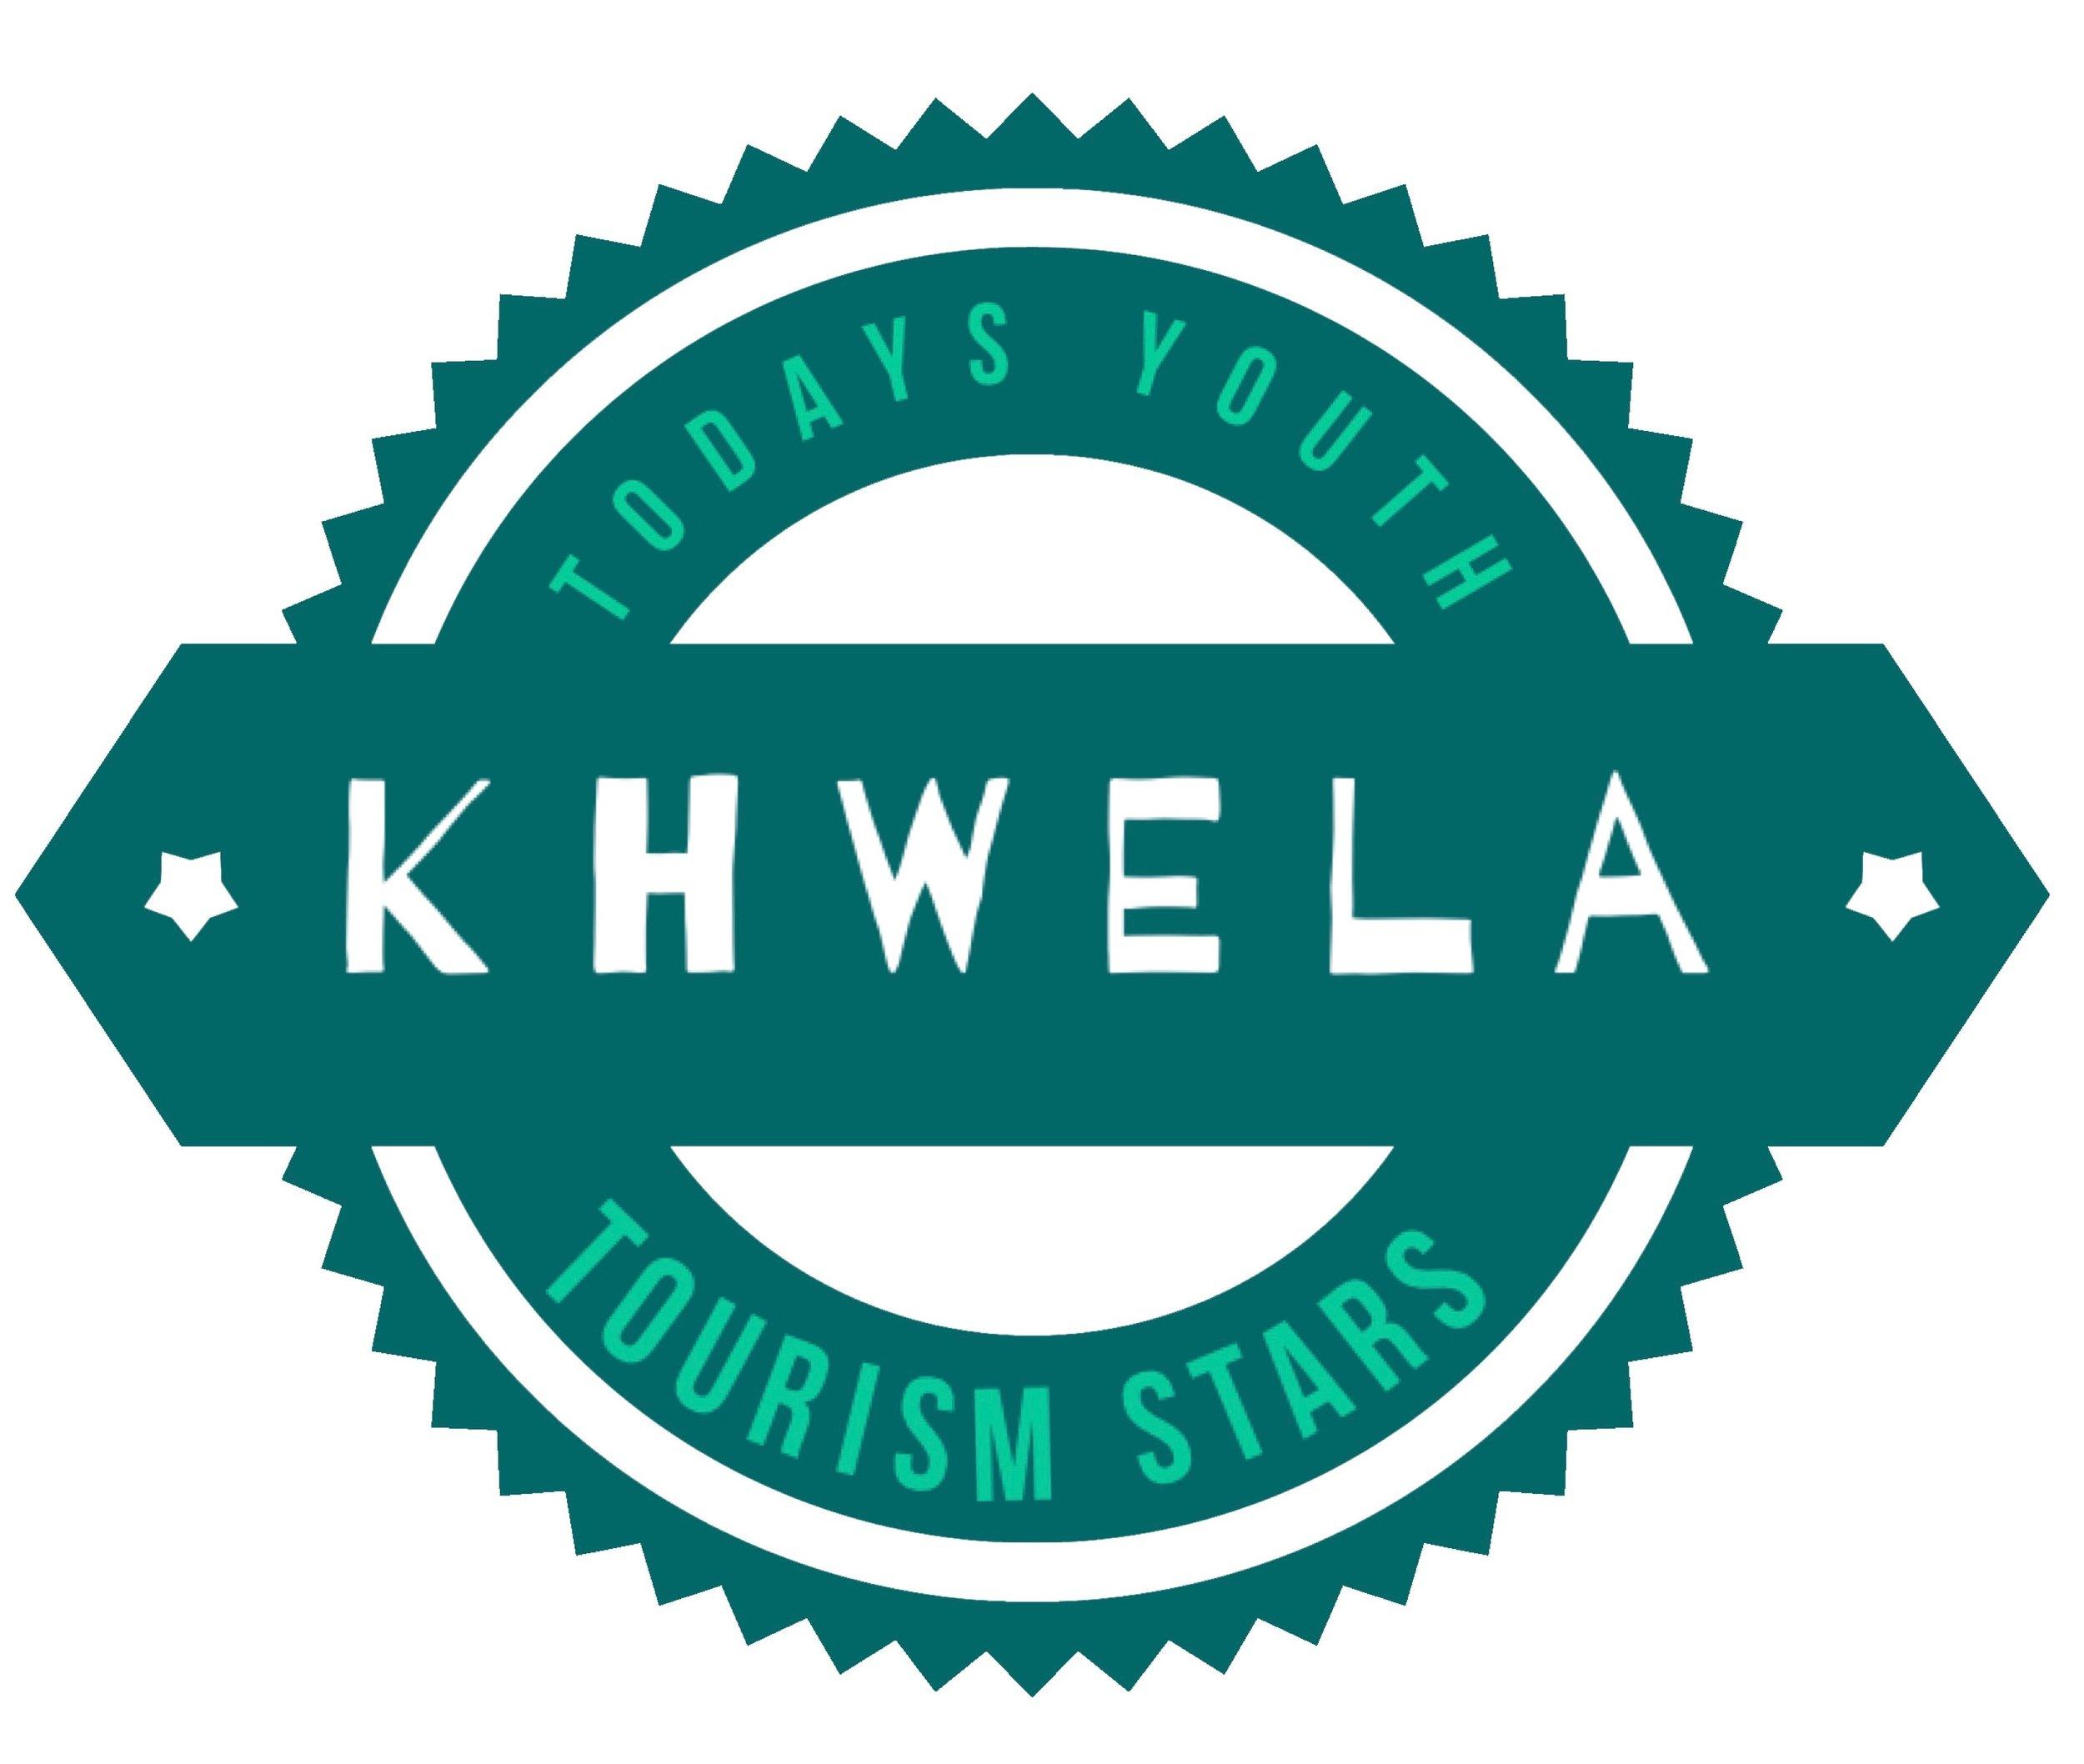 Khwela logo copy - asanda daraza.JPG